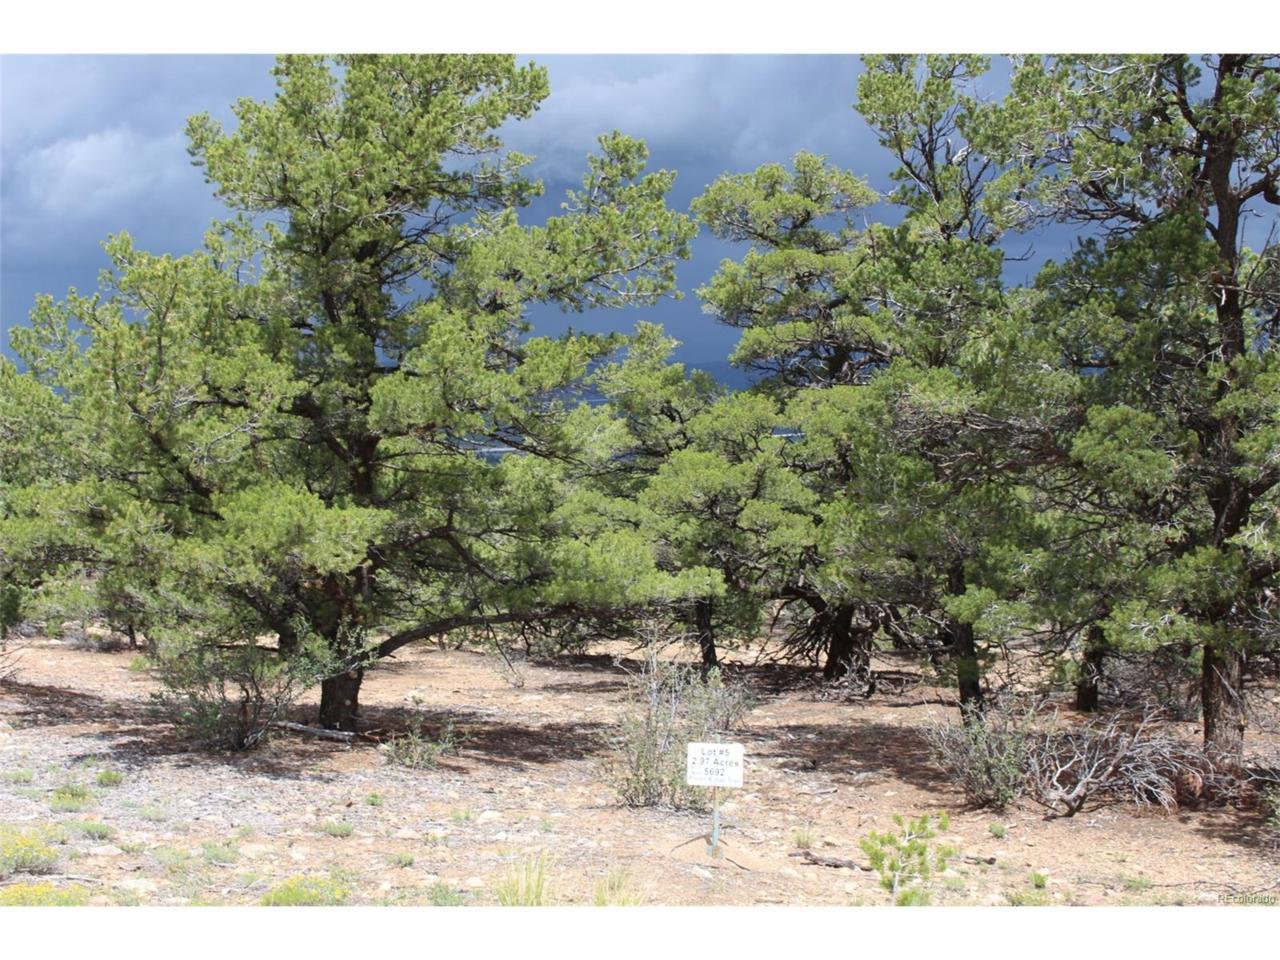 5692 Pinon Ridge Trail, Salida, CO 81201 (MLS #2888841) :: 8z Real Estate